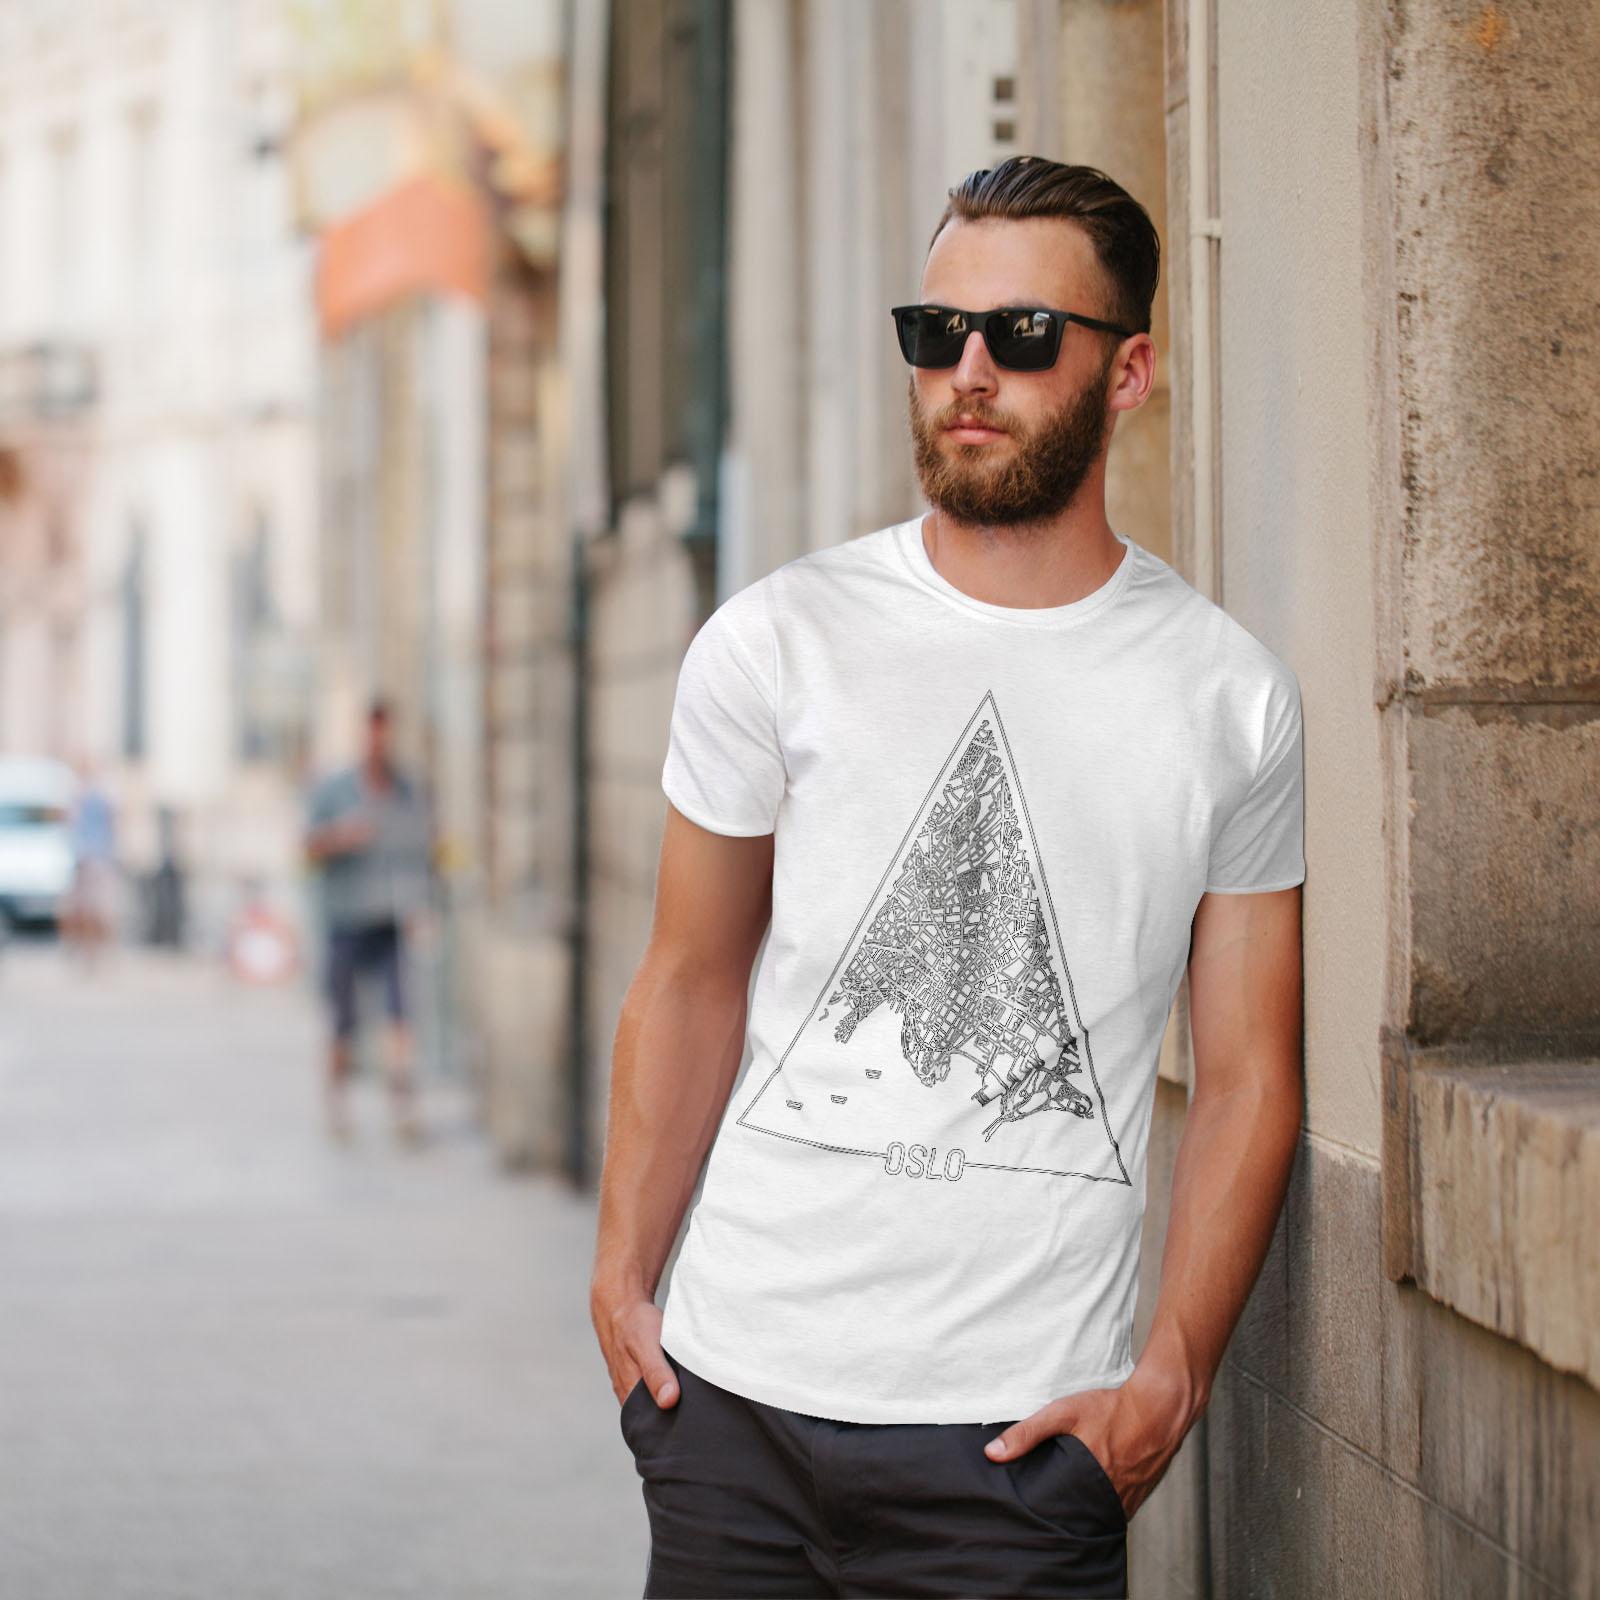 Wellcoda-Norvegia-Big-City-Oslo-da-uomo-T-shirt-Citta-design-grafico-stampato-T-shirt miniatura 11